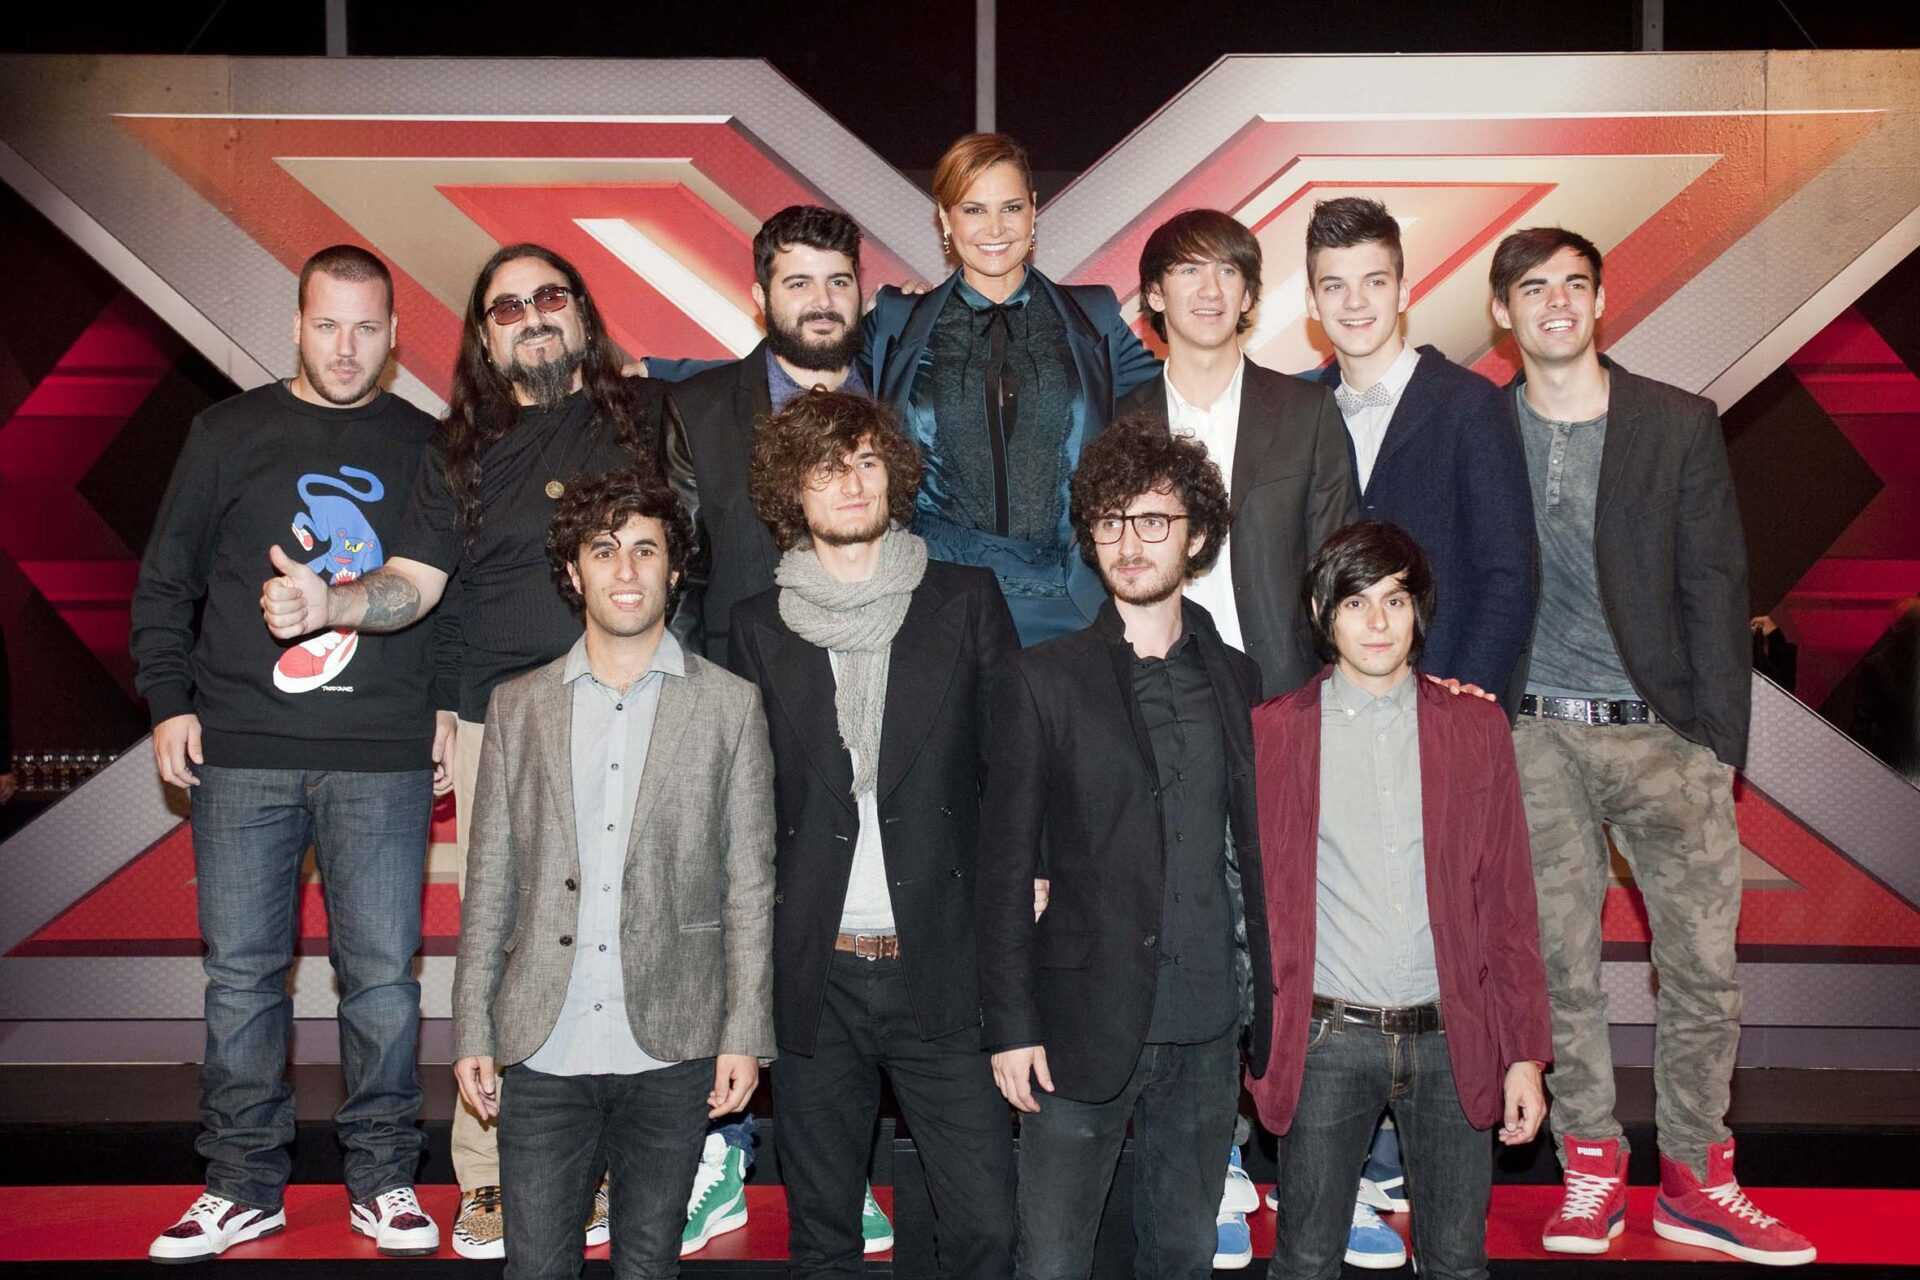 X Factor 2013: al via da questa sera | Digitale terrestre: Dtti.it